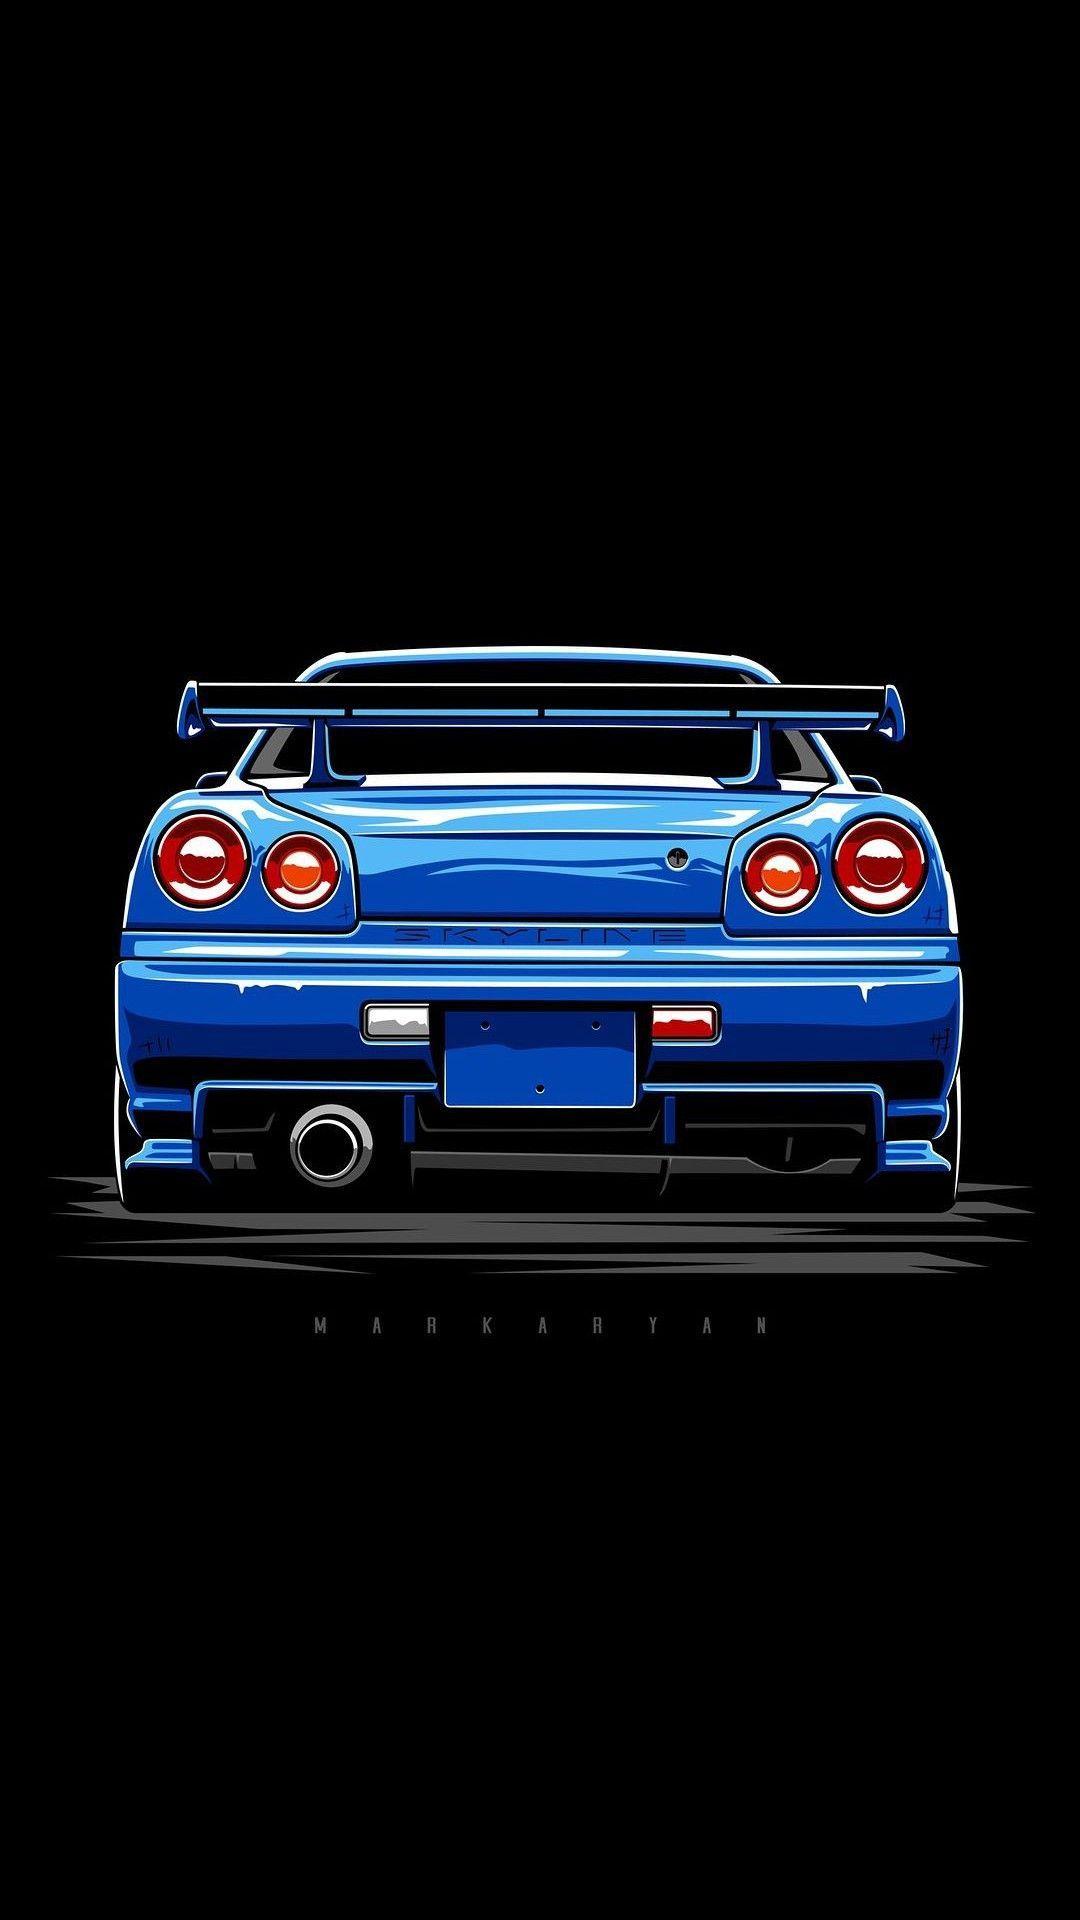 Nissan Skyline R34 日産スカイライン 車の壁紙 スカイライン ケンメリ